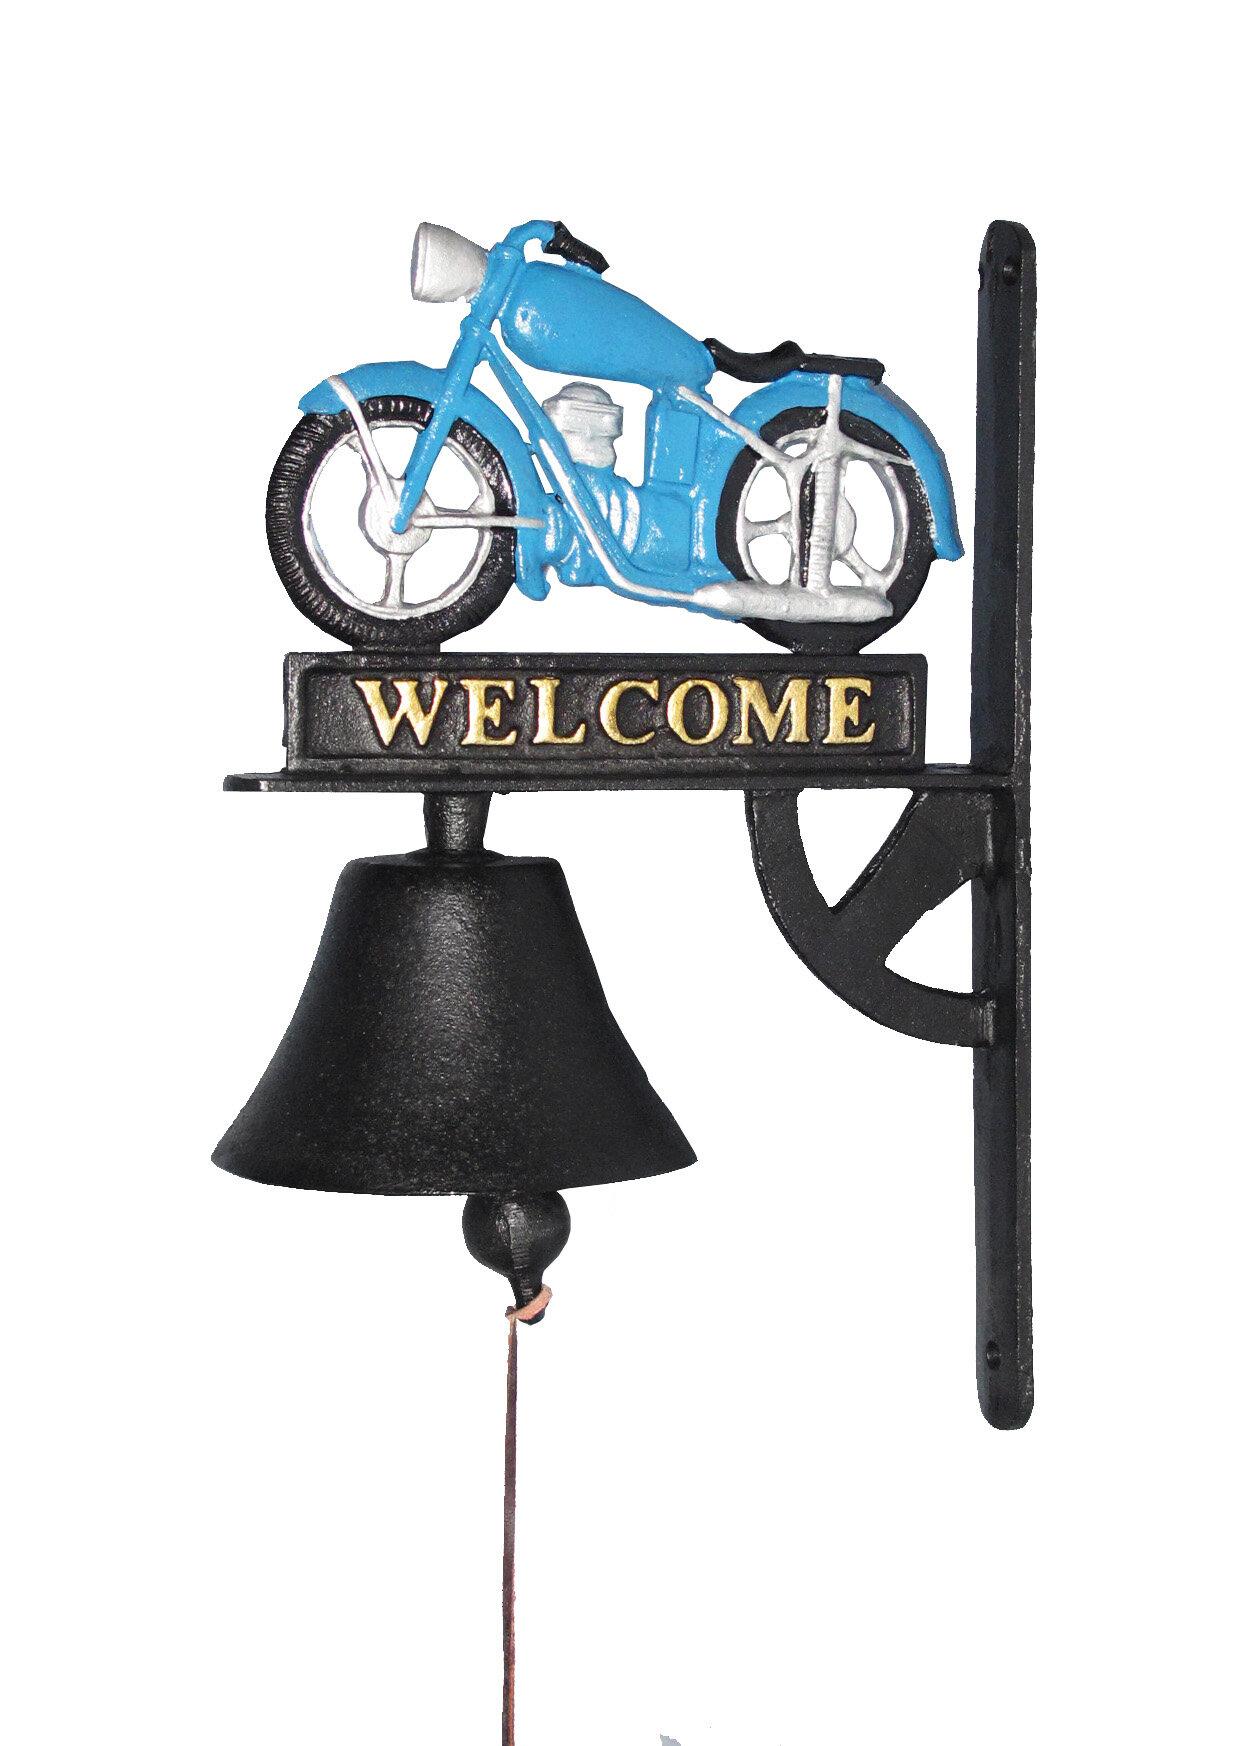 Charlton Home Motorbike Doorbell Cast Iron Door Chime Wayfair How To Add A Second